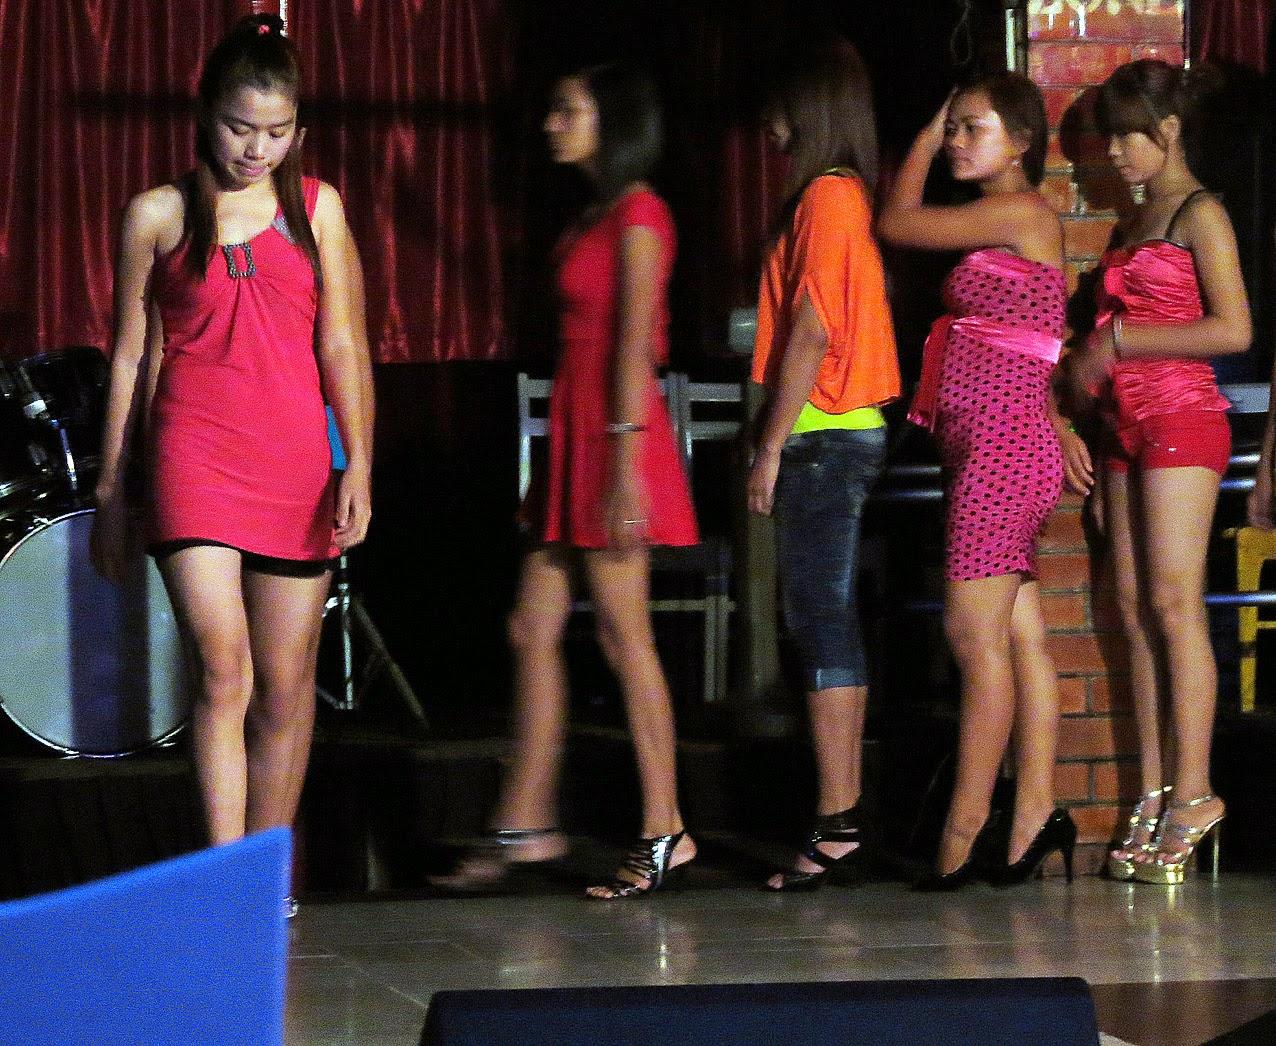 myanmar ladies naked photos